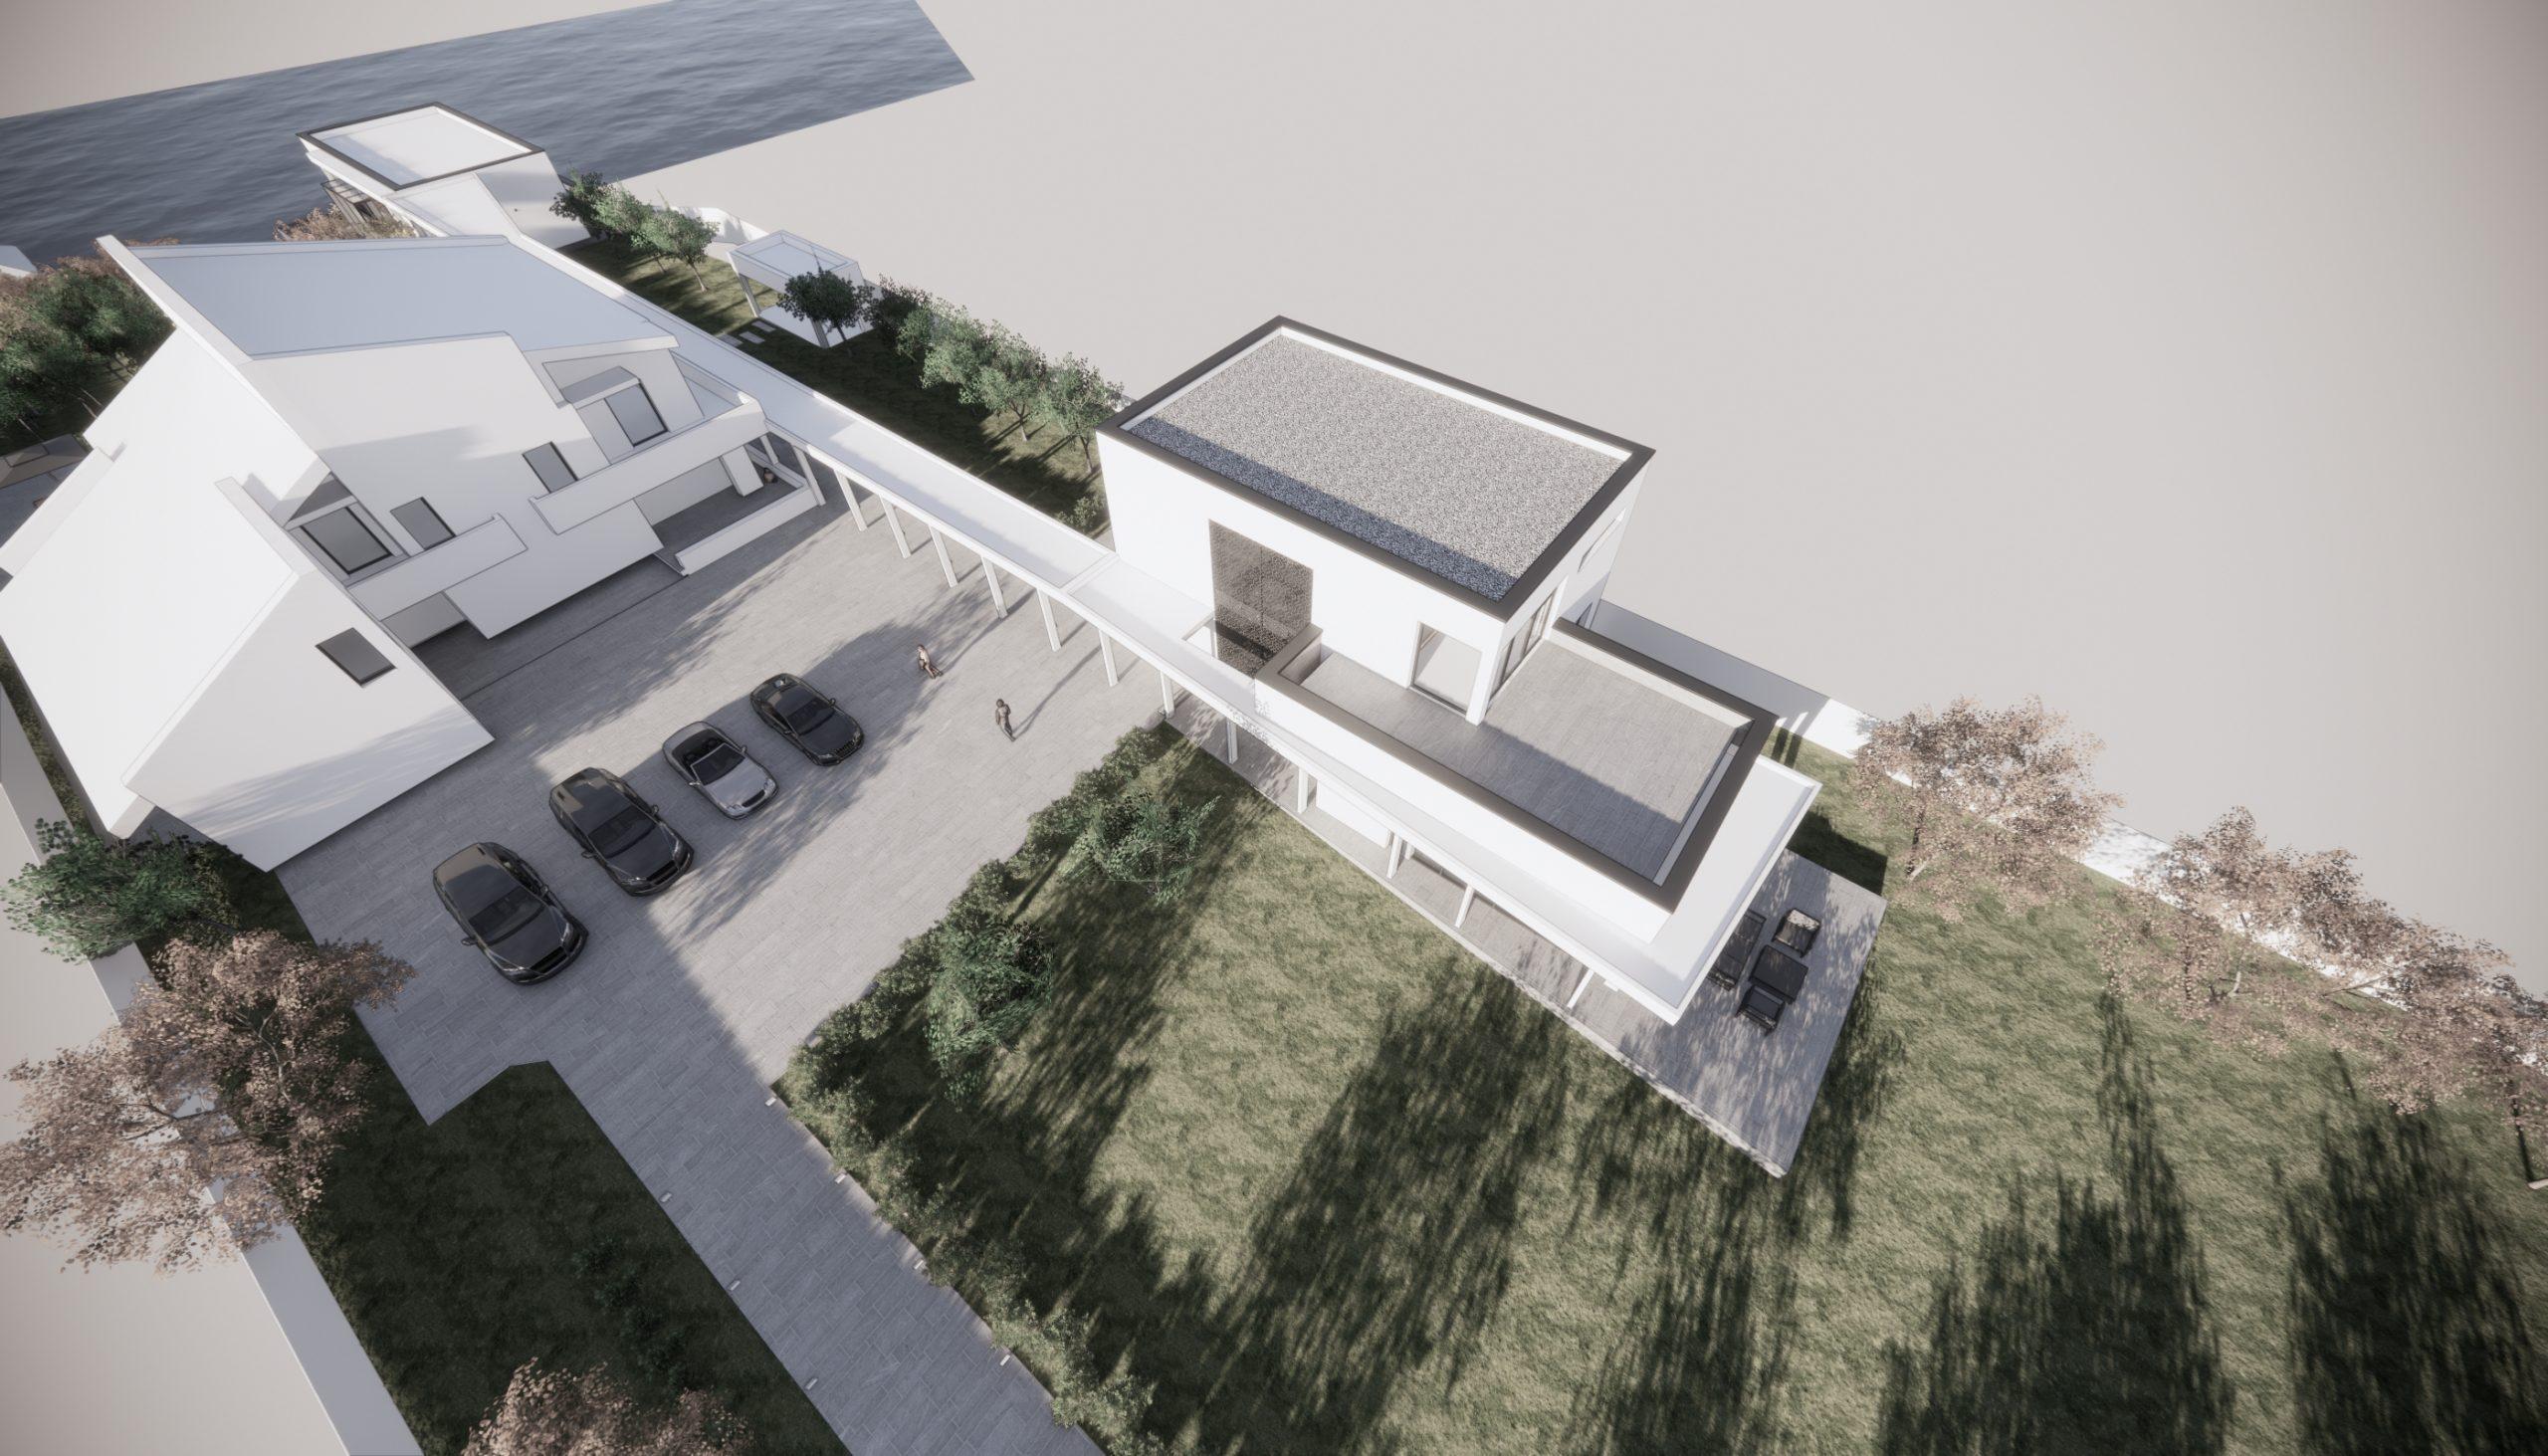 https://nbc-arhitect.ro/wp-content/uploads/2020/11/NBC-Arhitect-_-residential-_-2x-Snagov-_-Snagov-Romania_17-scaled.jpg